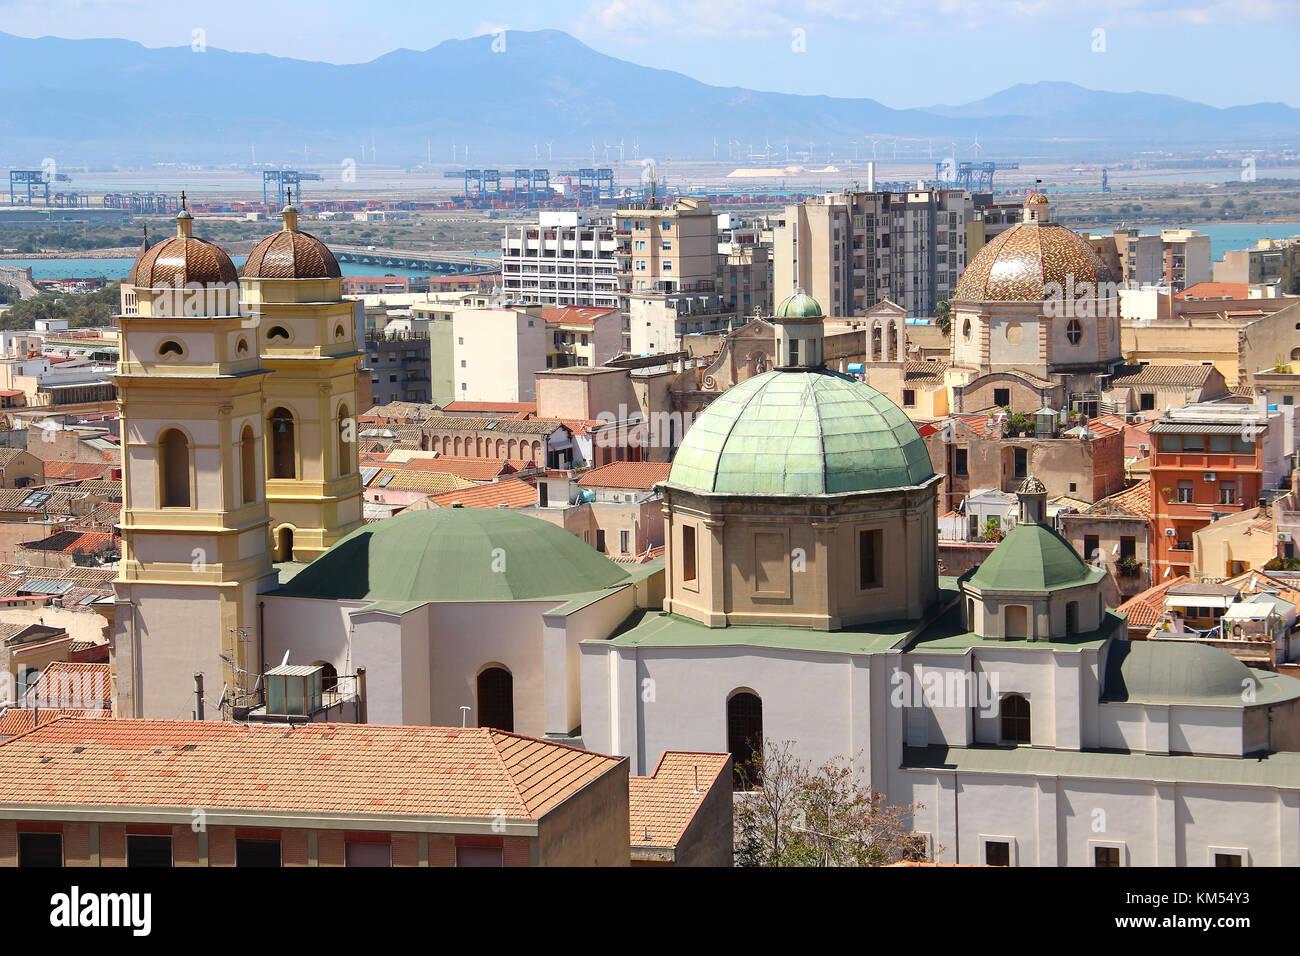 Kirchen un-Altstadt von Cagliari, Sardinien, Italien Stockbild